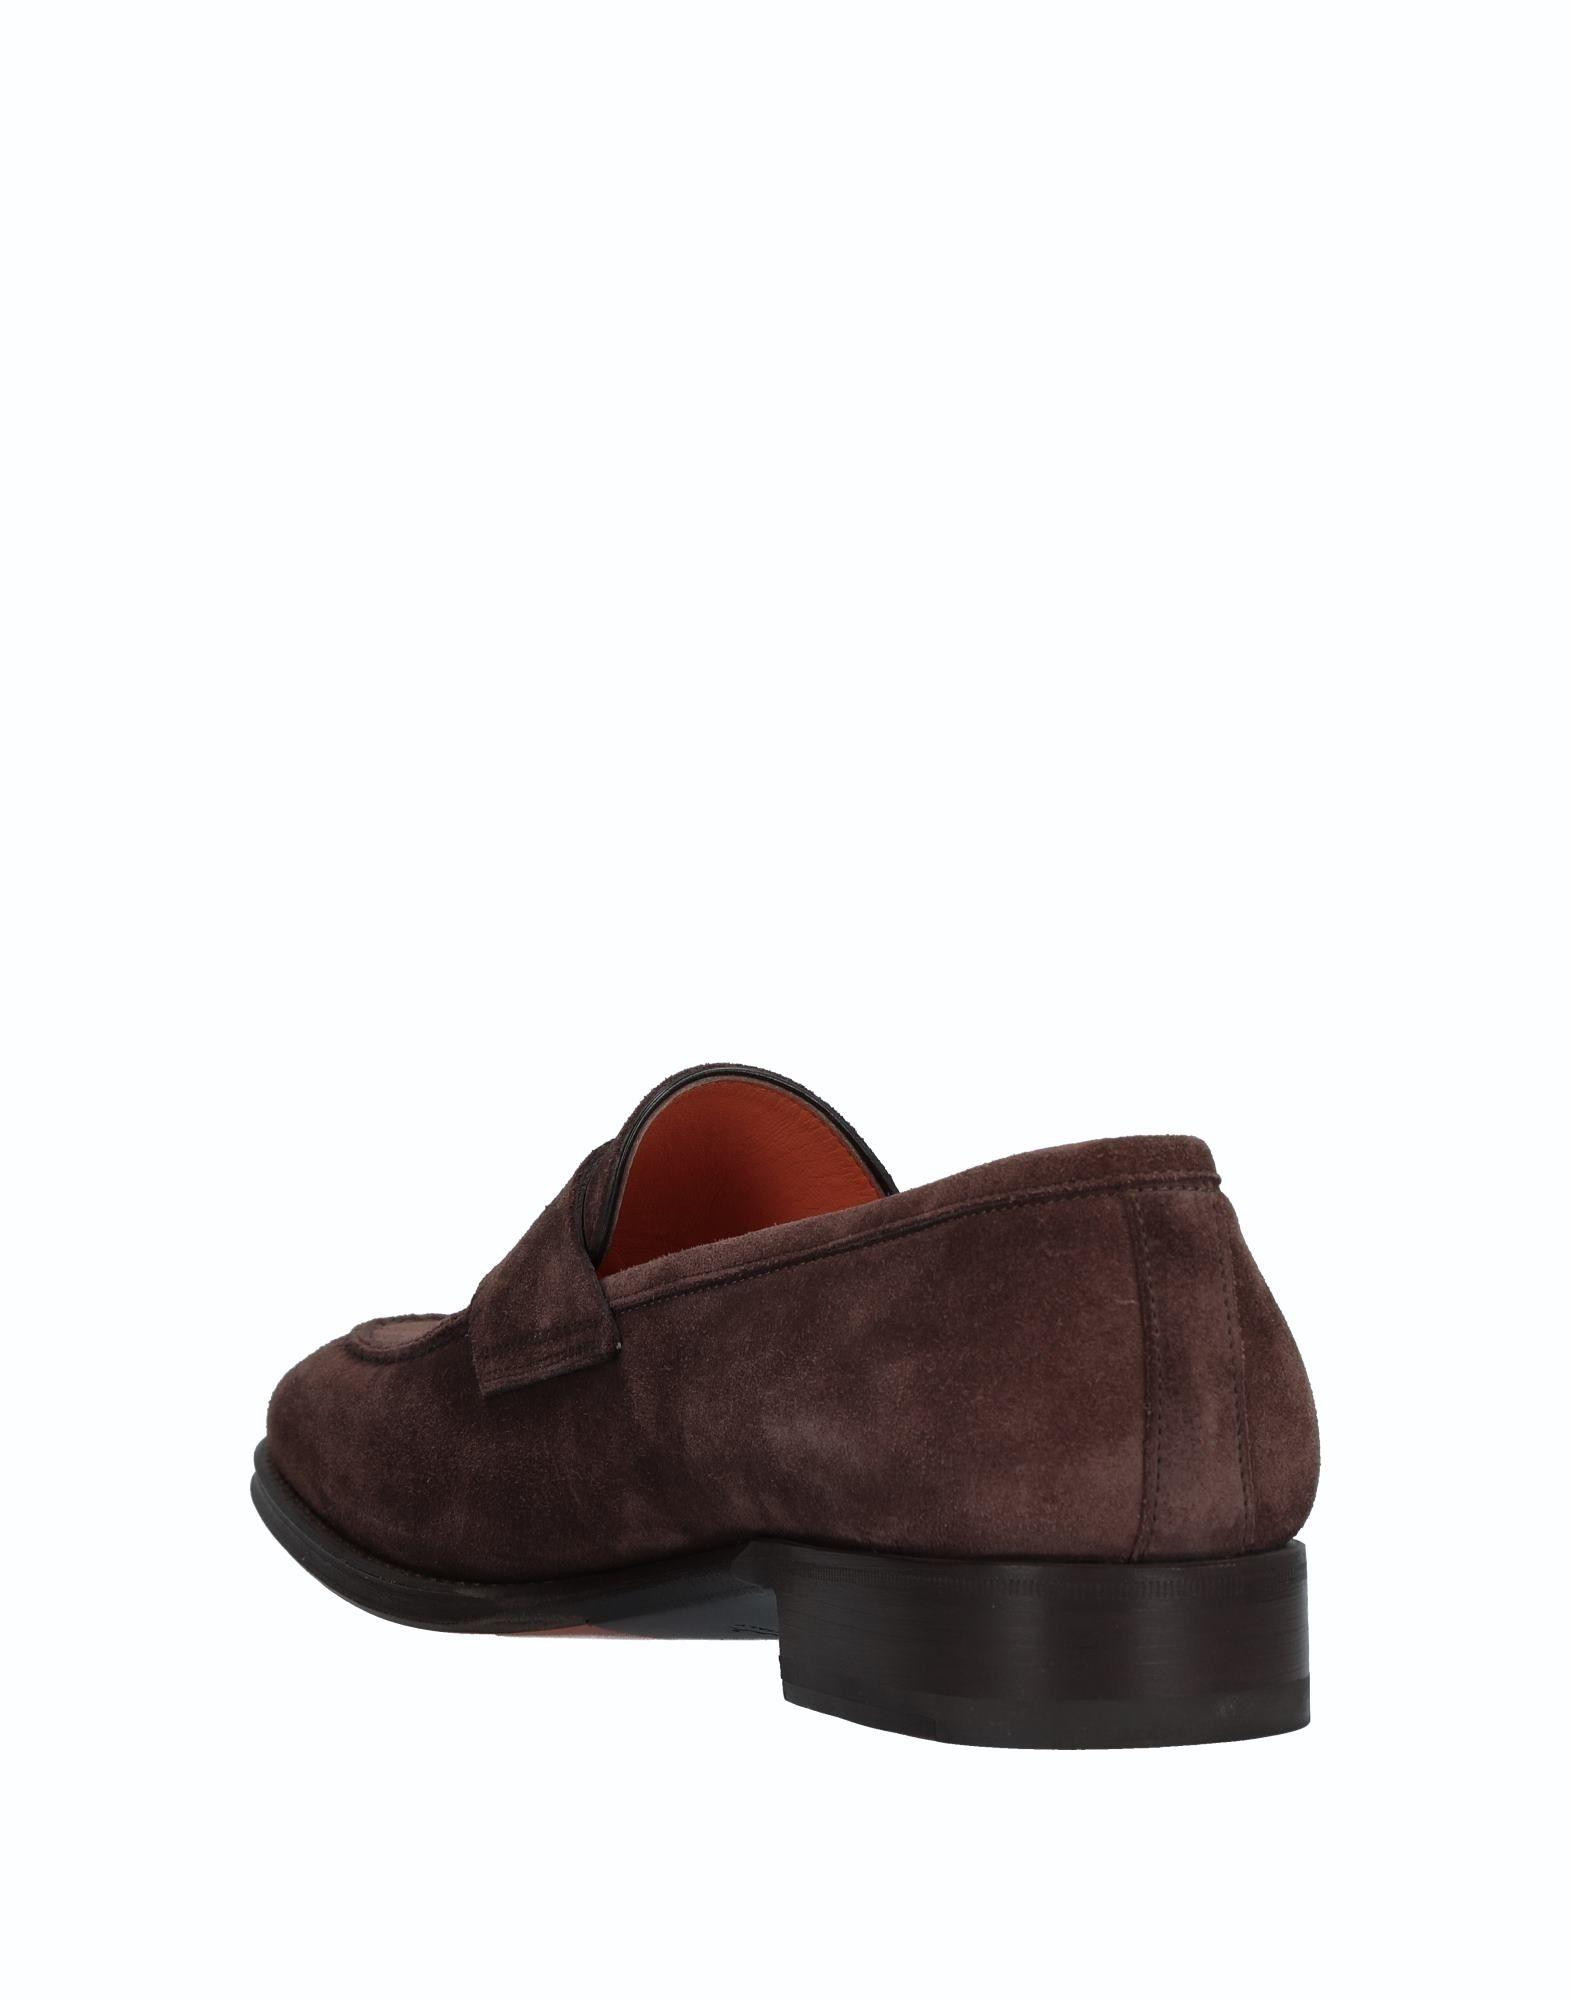 Santoni Mokassins Herren  11519615BS Gute Qualität beliebte Schuhe